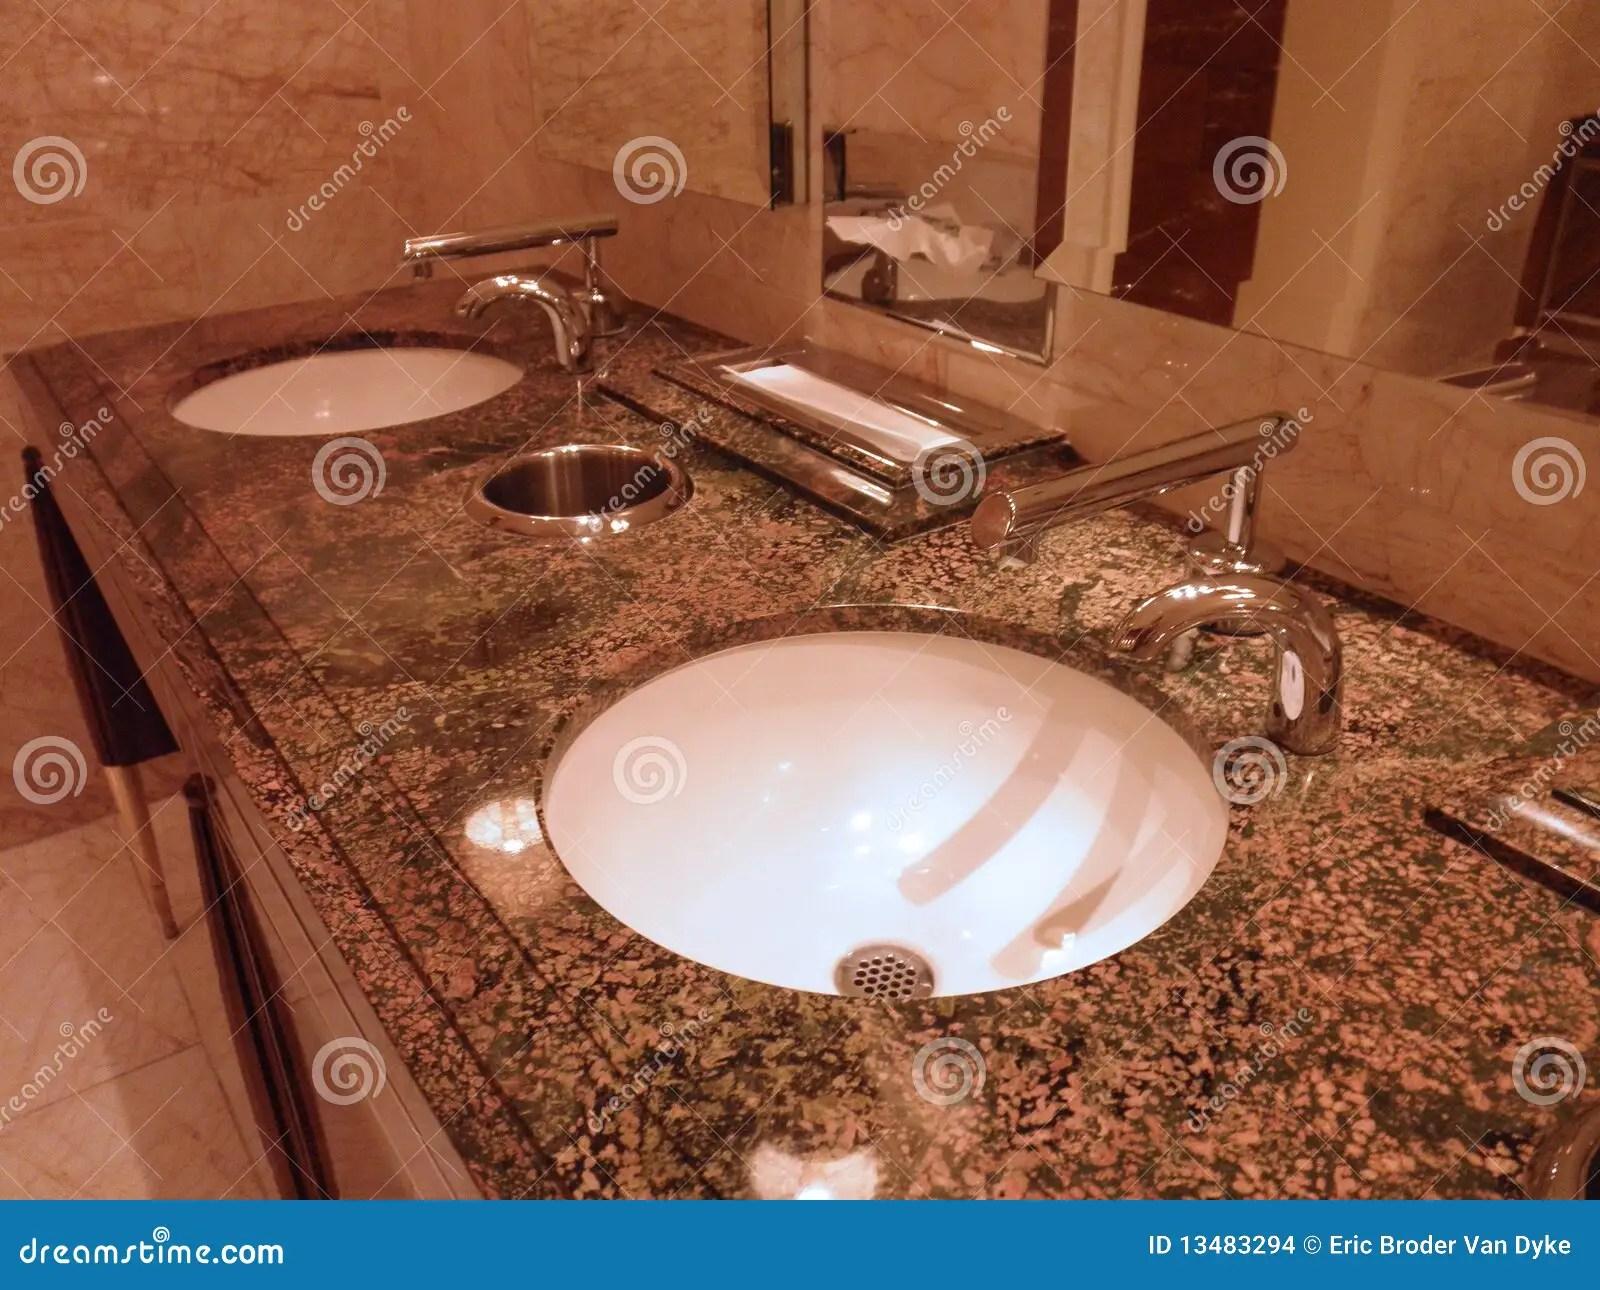 Fancy Bathroom Sinks Editorial Stock Image  Image 13483294